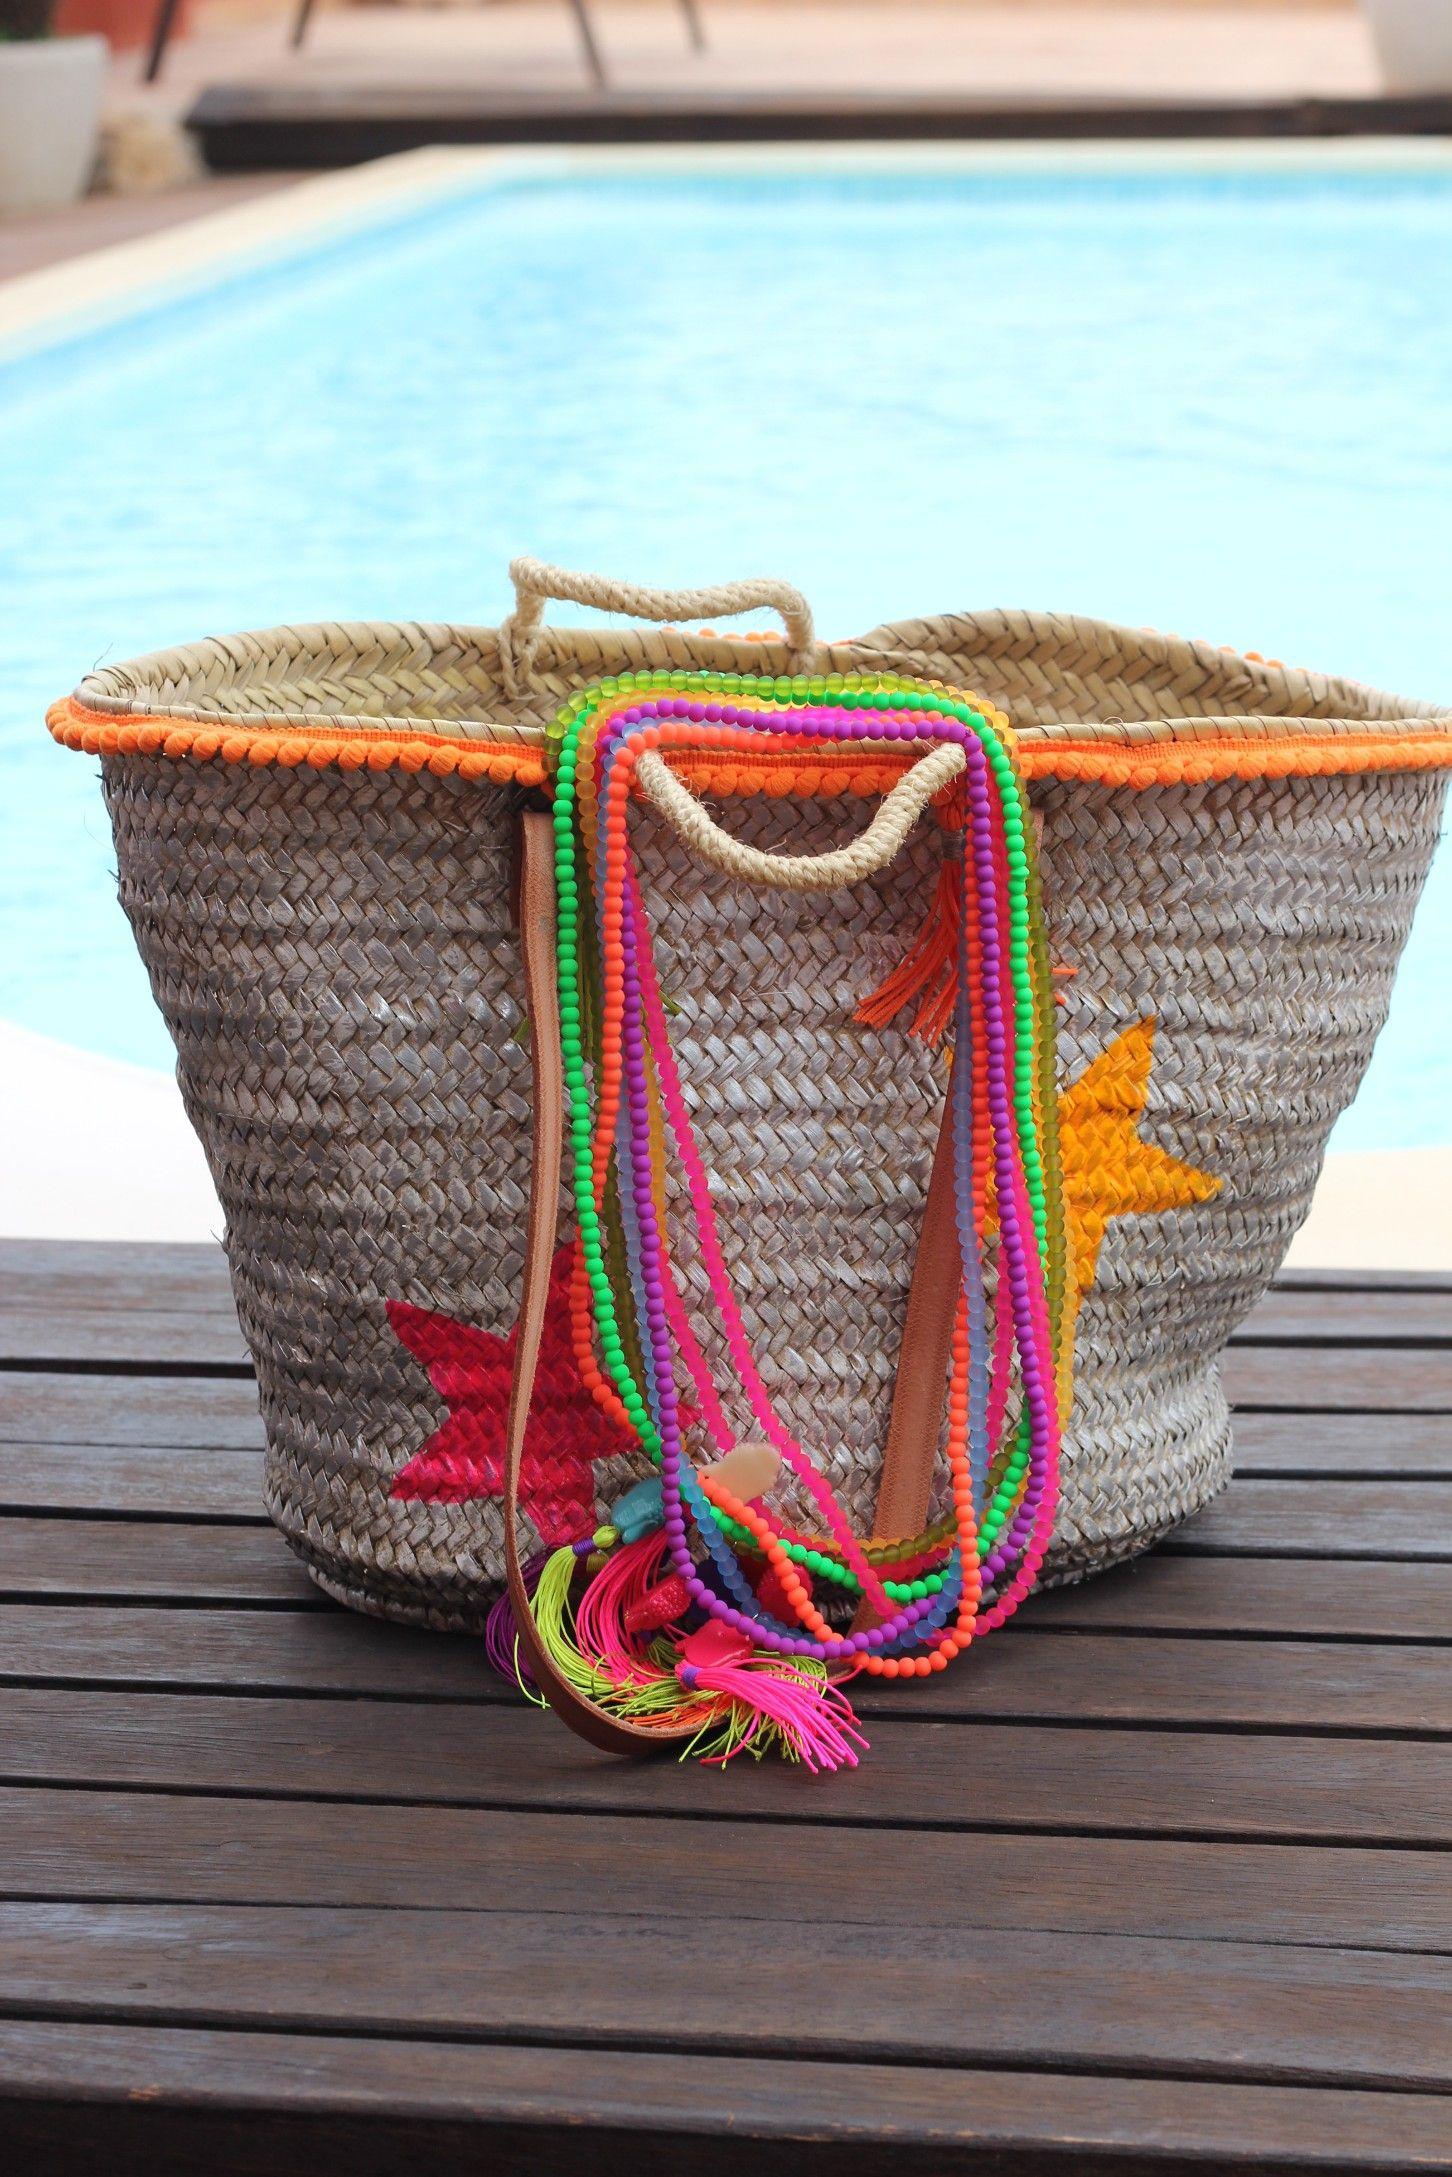 Rieten Tas Met Ster : Bytuky ibiza bag rieten tas met ster bolsos